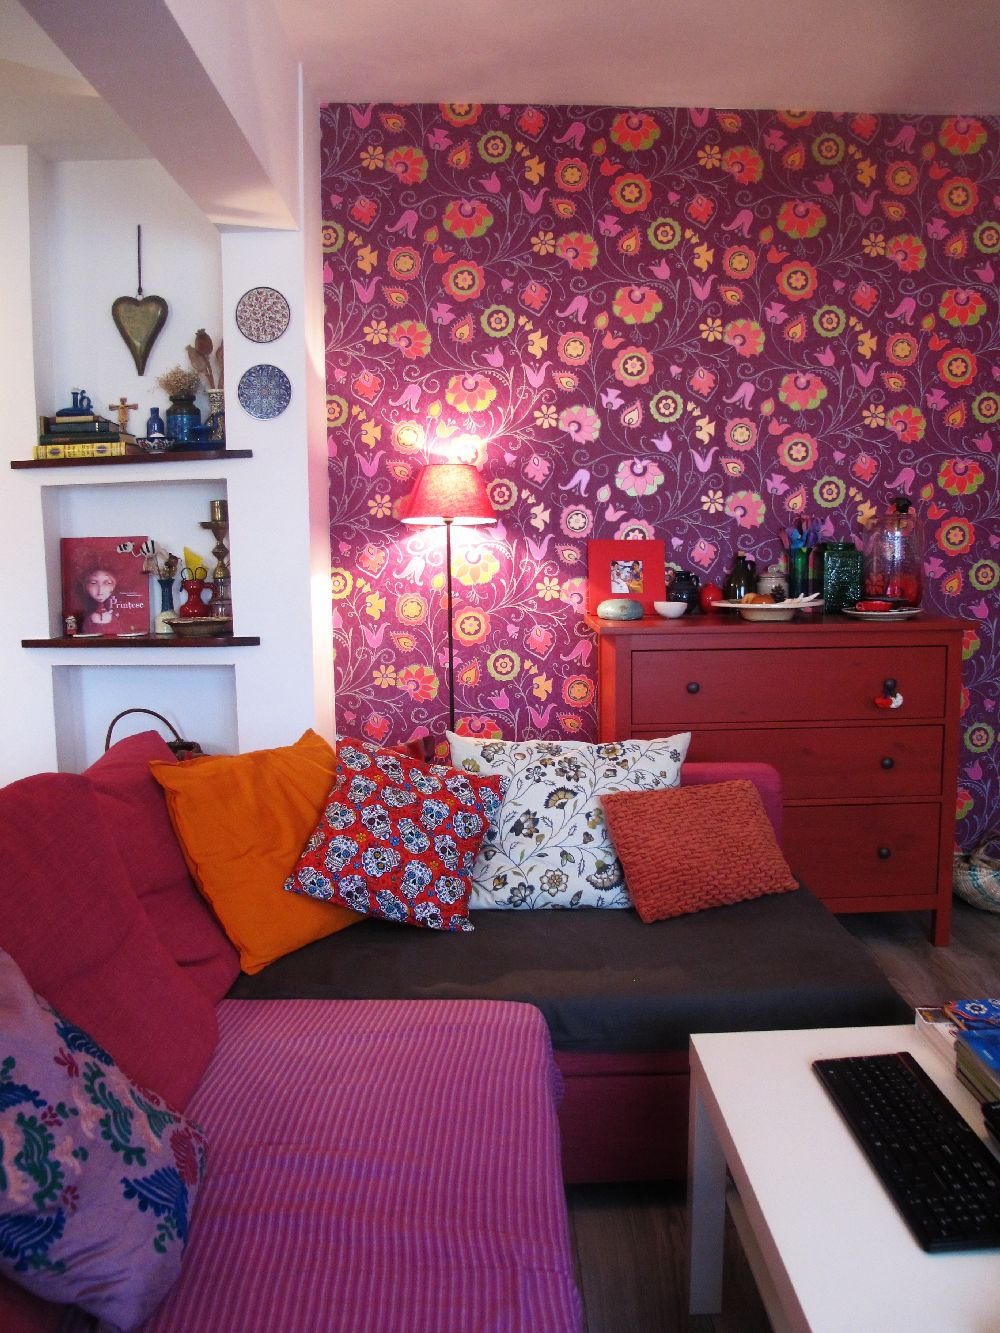 adelaparvu.com despre apartament 3 camere colorat in Sibiu, Foto Adela Parvu (74)